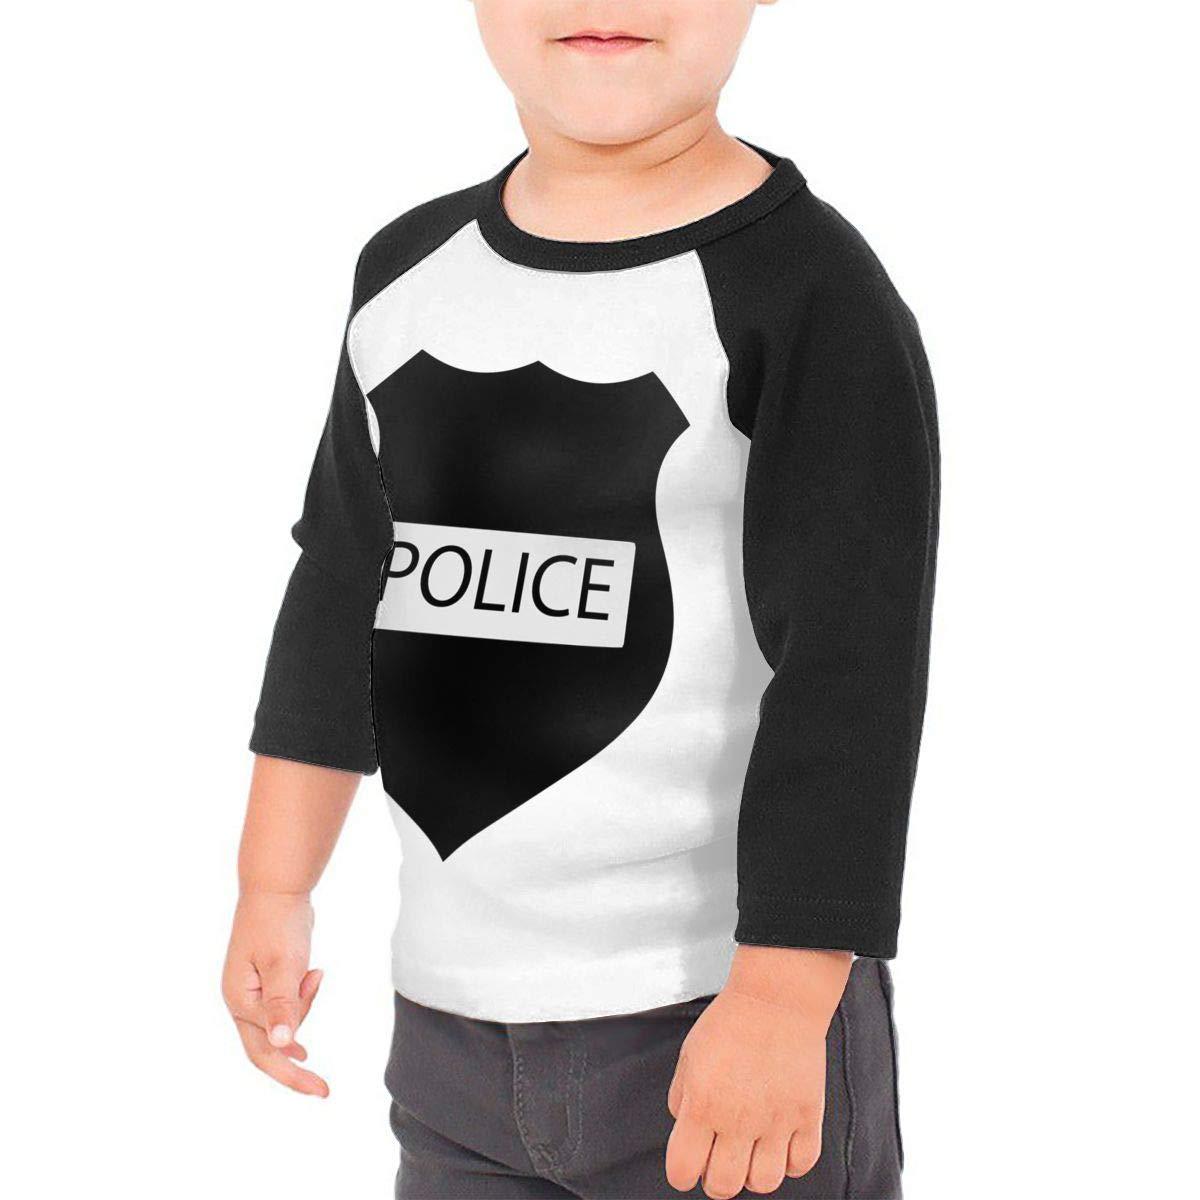 Kocvbng I Trust Police Black Raglan 3//4 Sleeves Shirts for Girl Boys